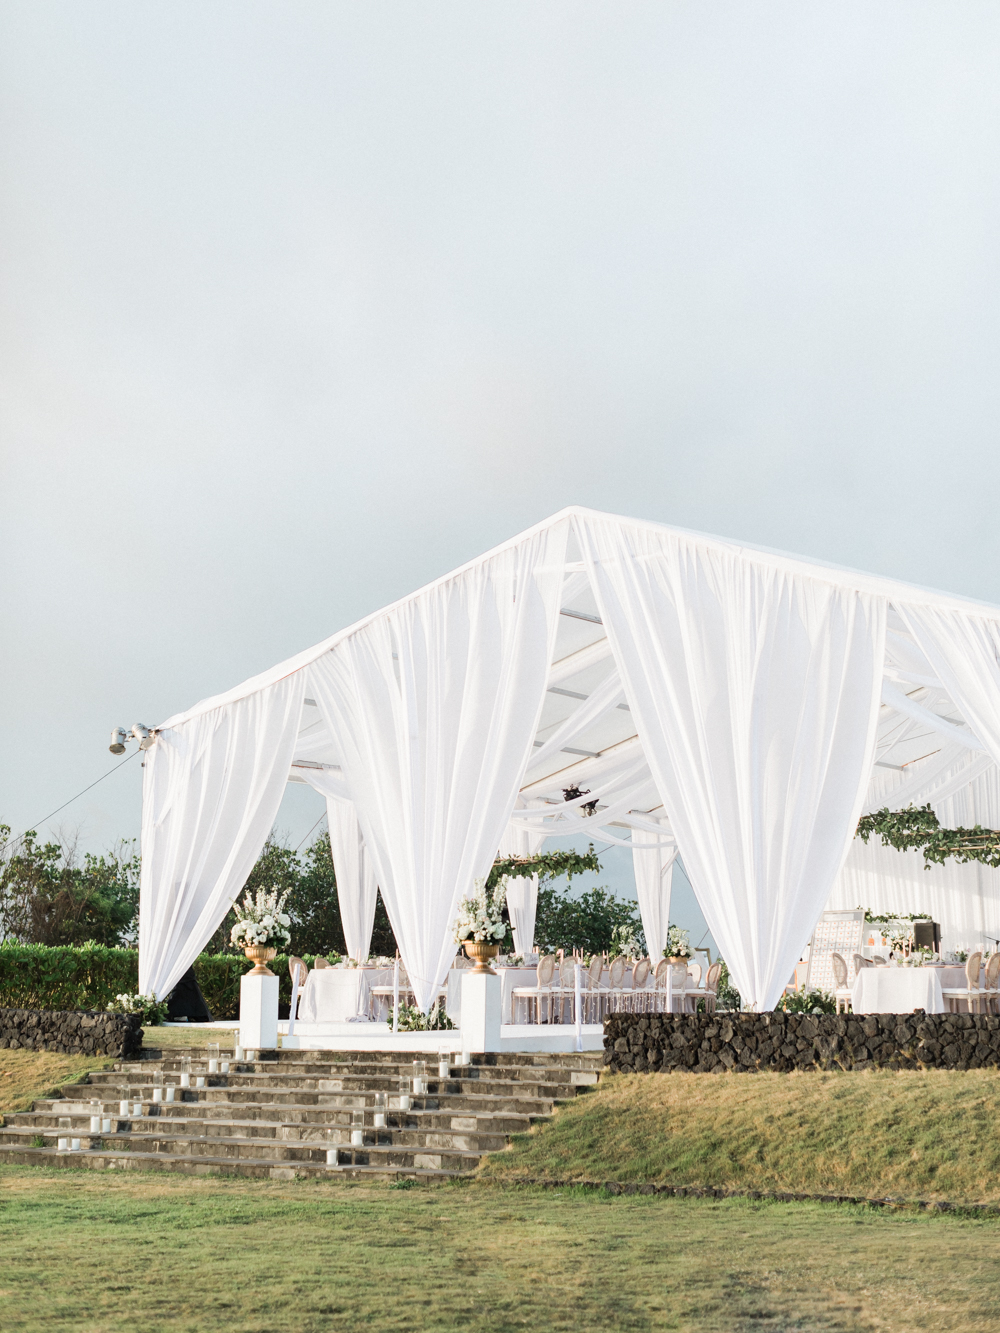 Bali_Real_Wedding_(c)_Rory_Wylie-89.jpg